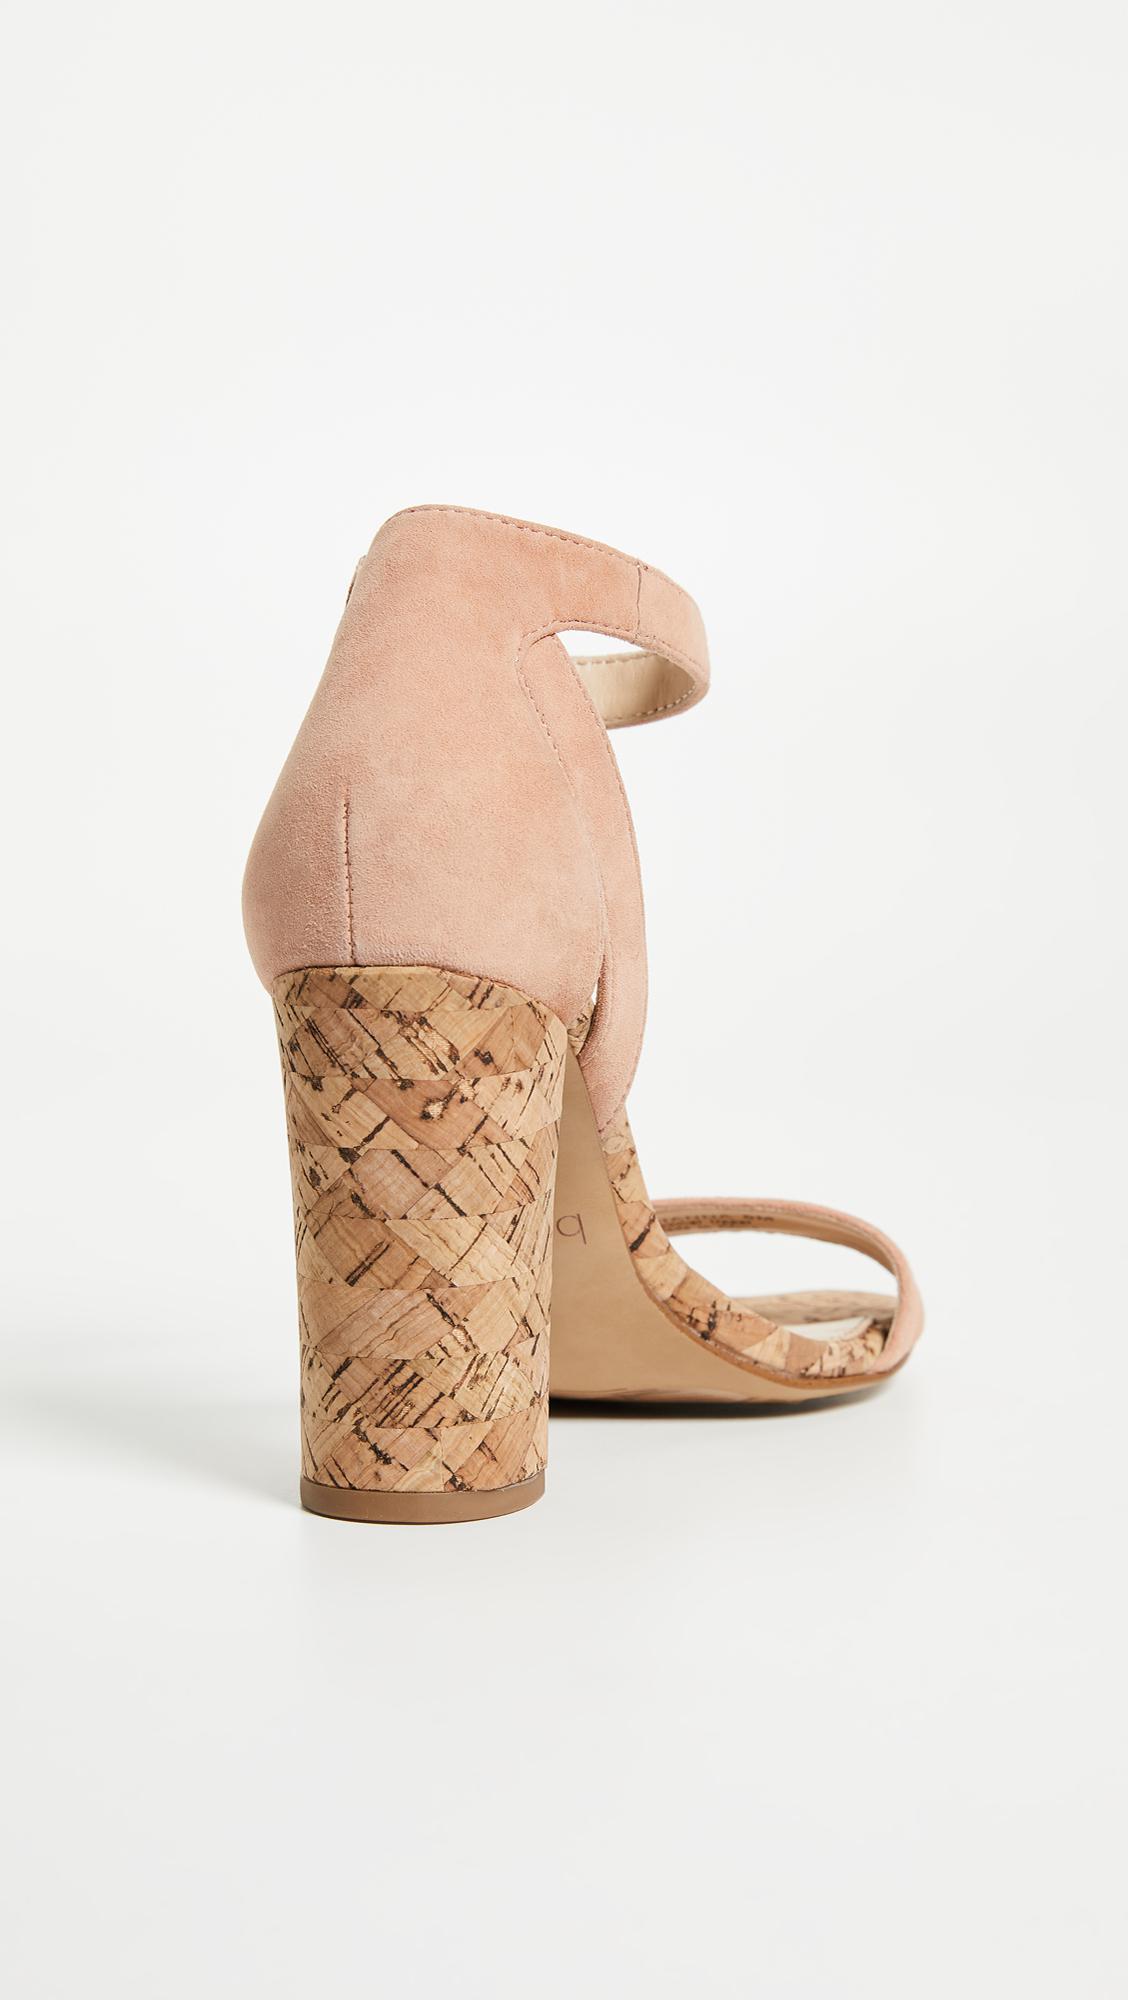 2f08a43656d Botkier Gianna Block Heel Sandals in Natural - Lyst